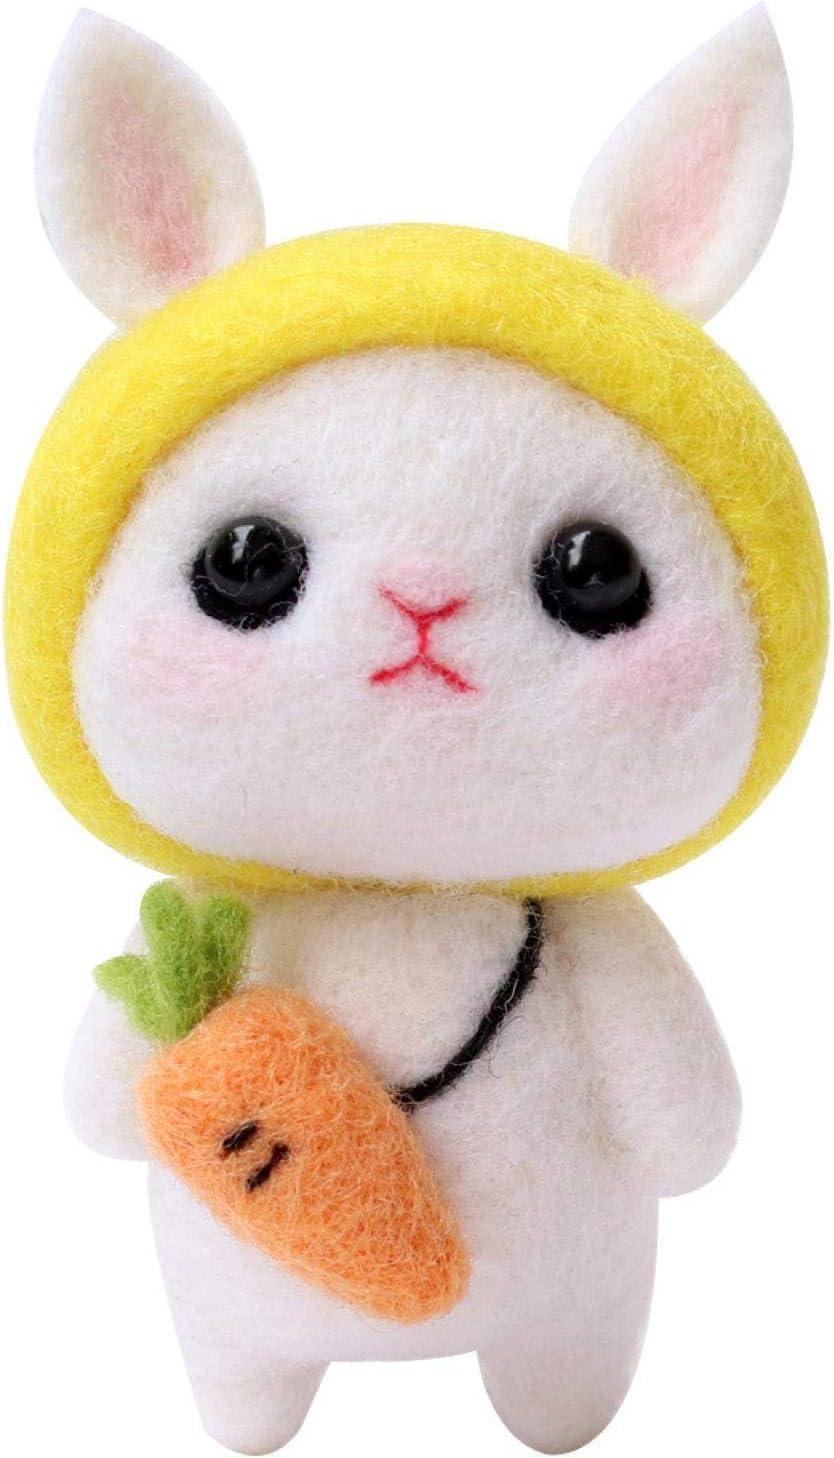 Cute Wool Felt Hand New Shipping Free Shipping Handmade Bunny Adult Carrot Las Vegas Mall Crafts